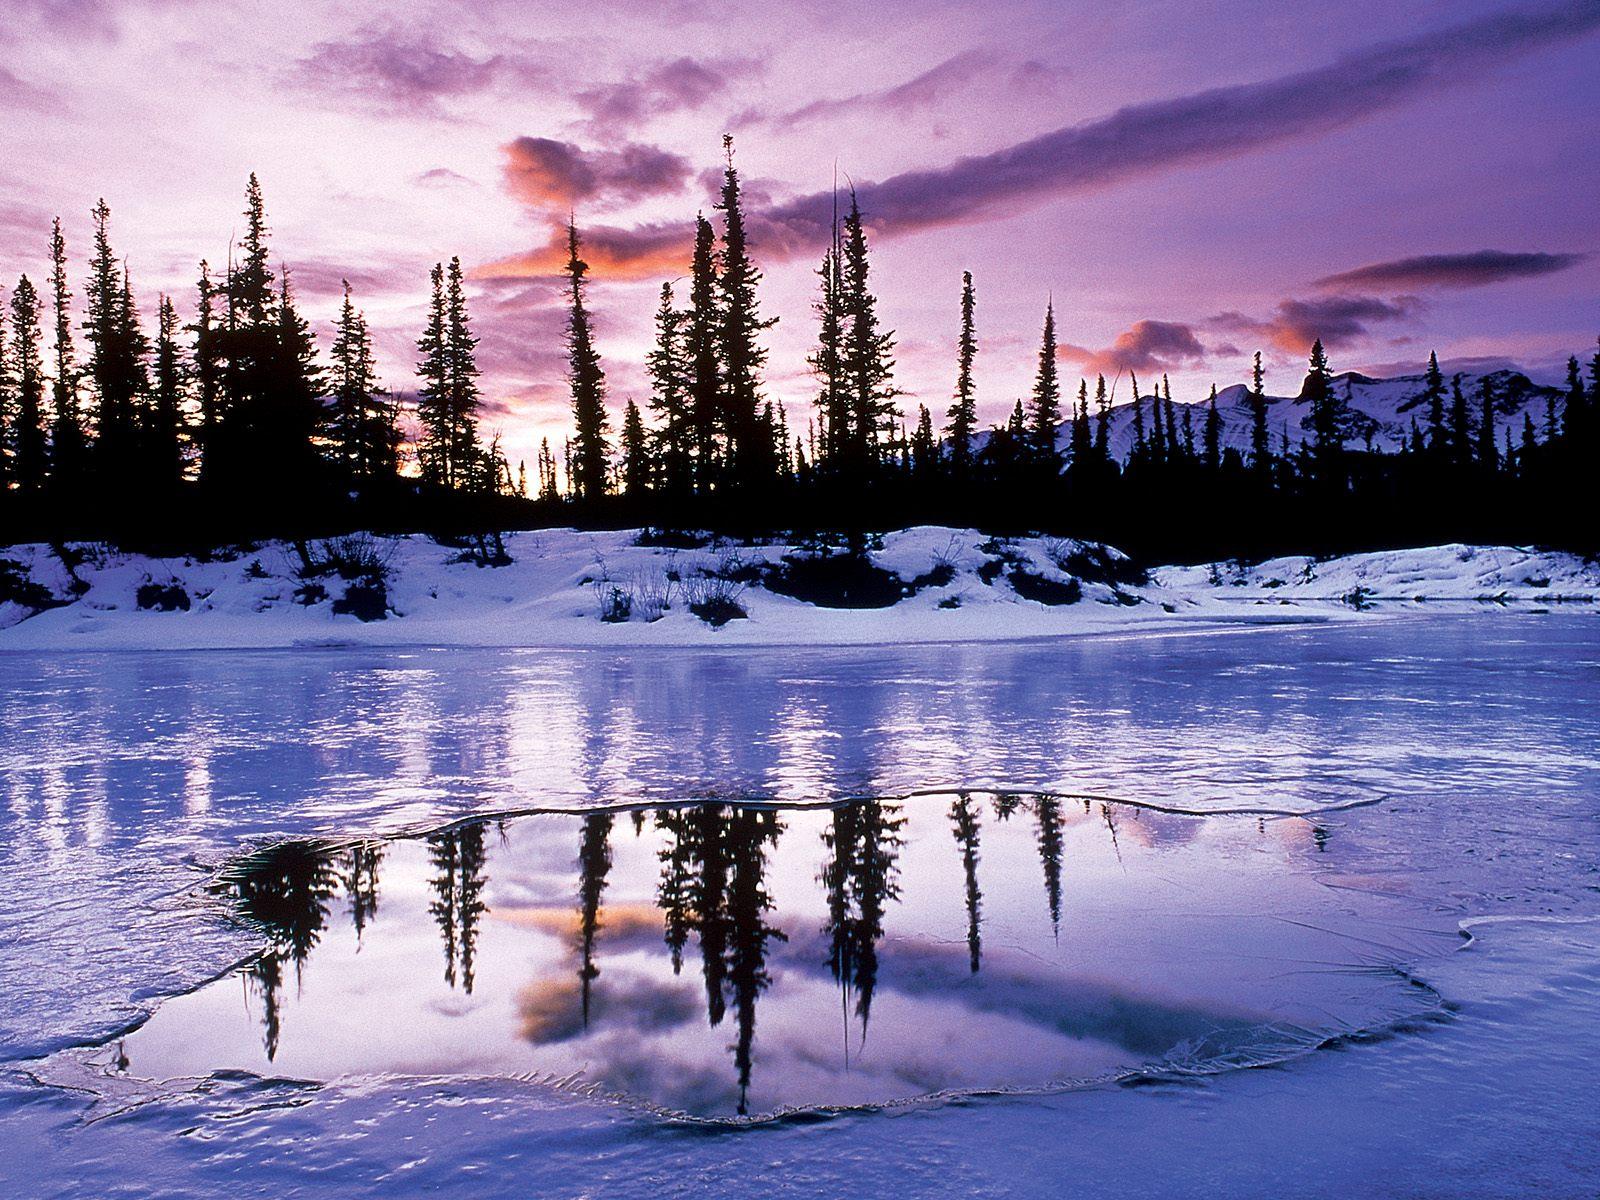 Best Wallpaper Collection: Best Winter Wallpapers